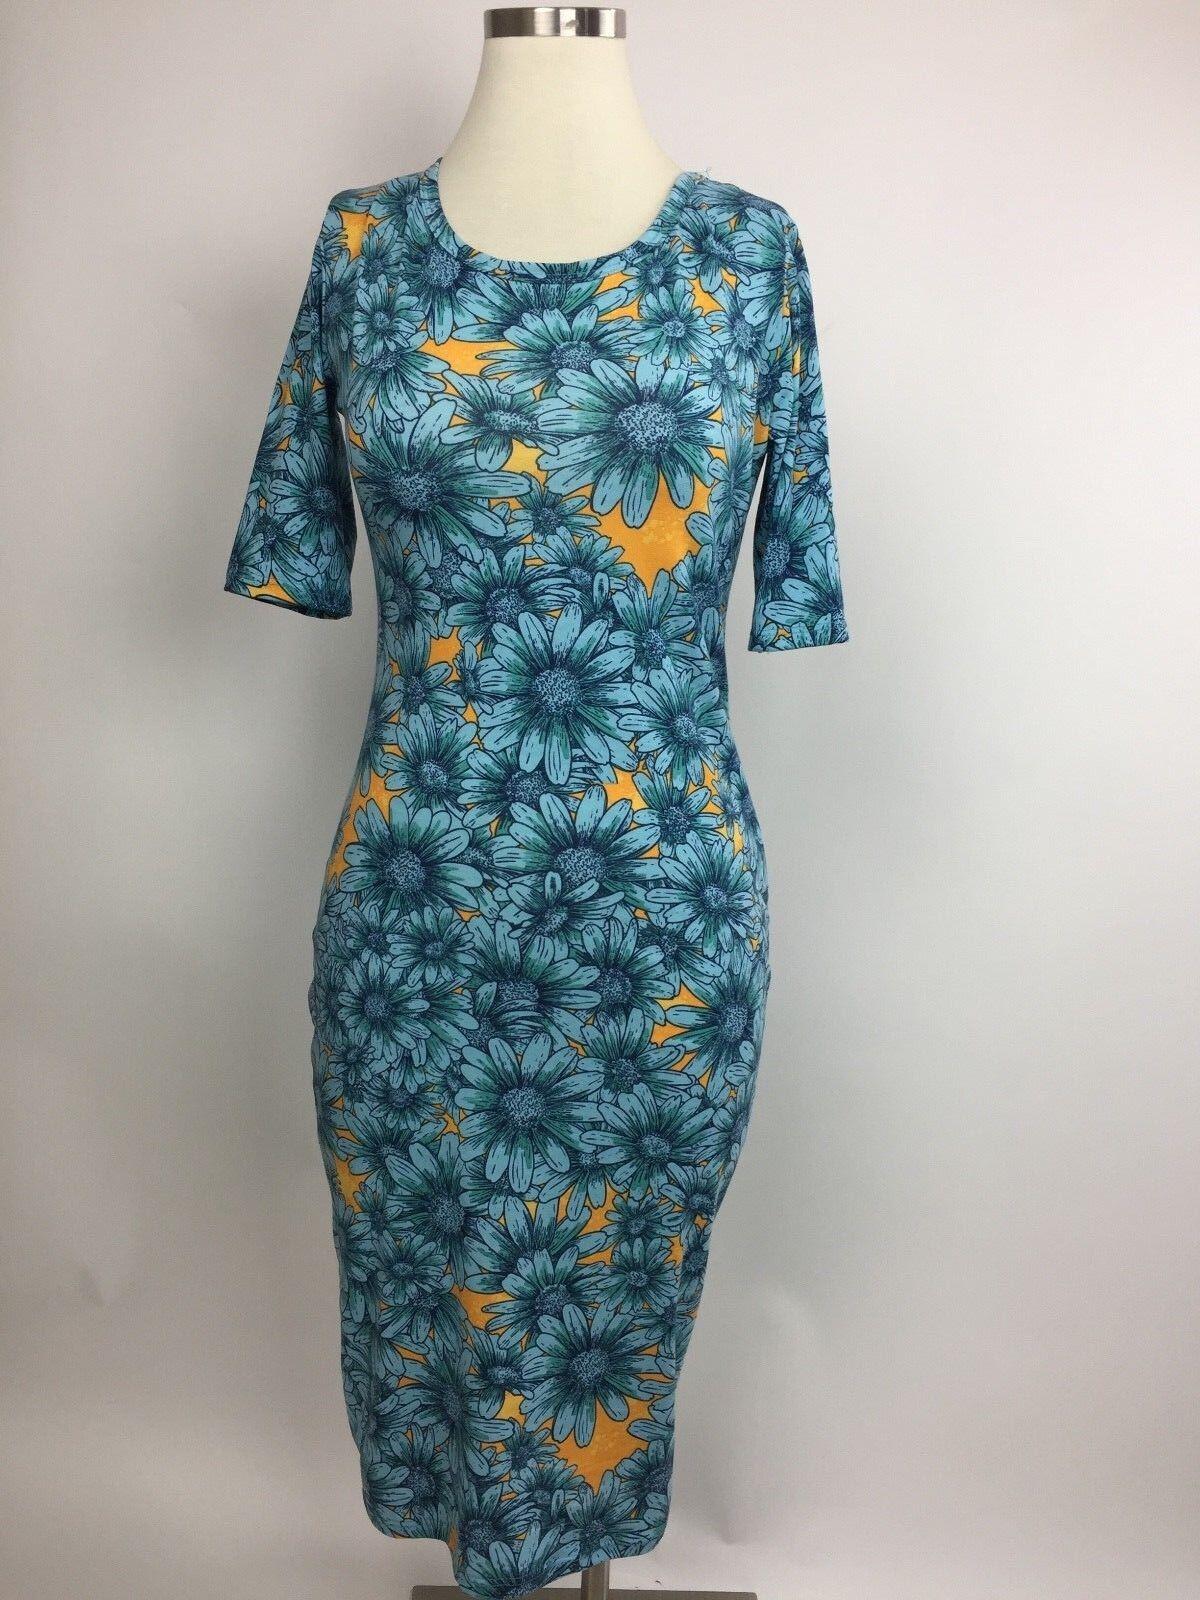 LulaRoe bluee Yellow Mod Sunflower Floral Julia Pencil Stretch Dress XS Nice